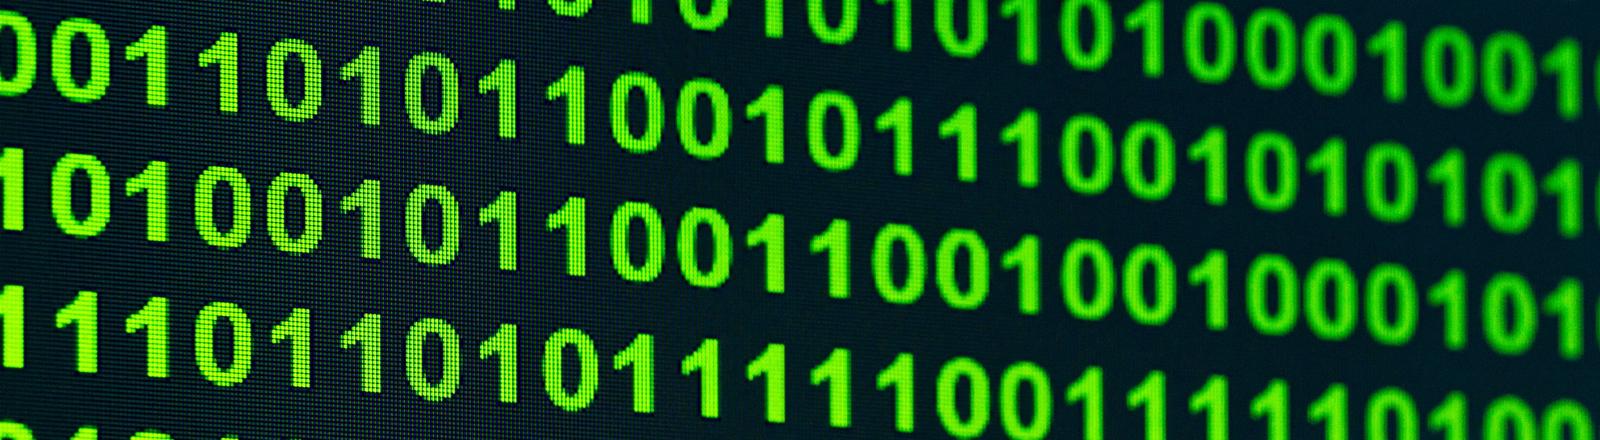 Binärcode auf Screen